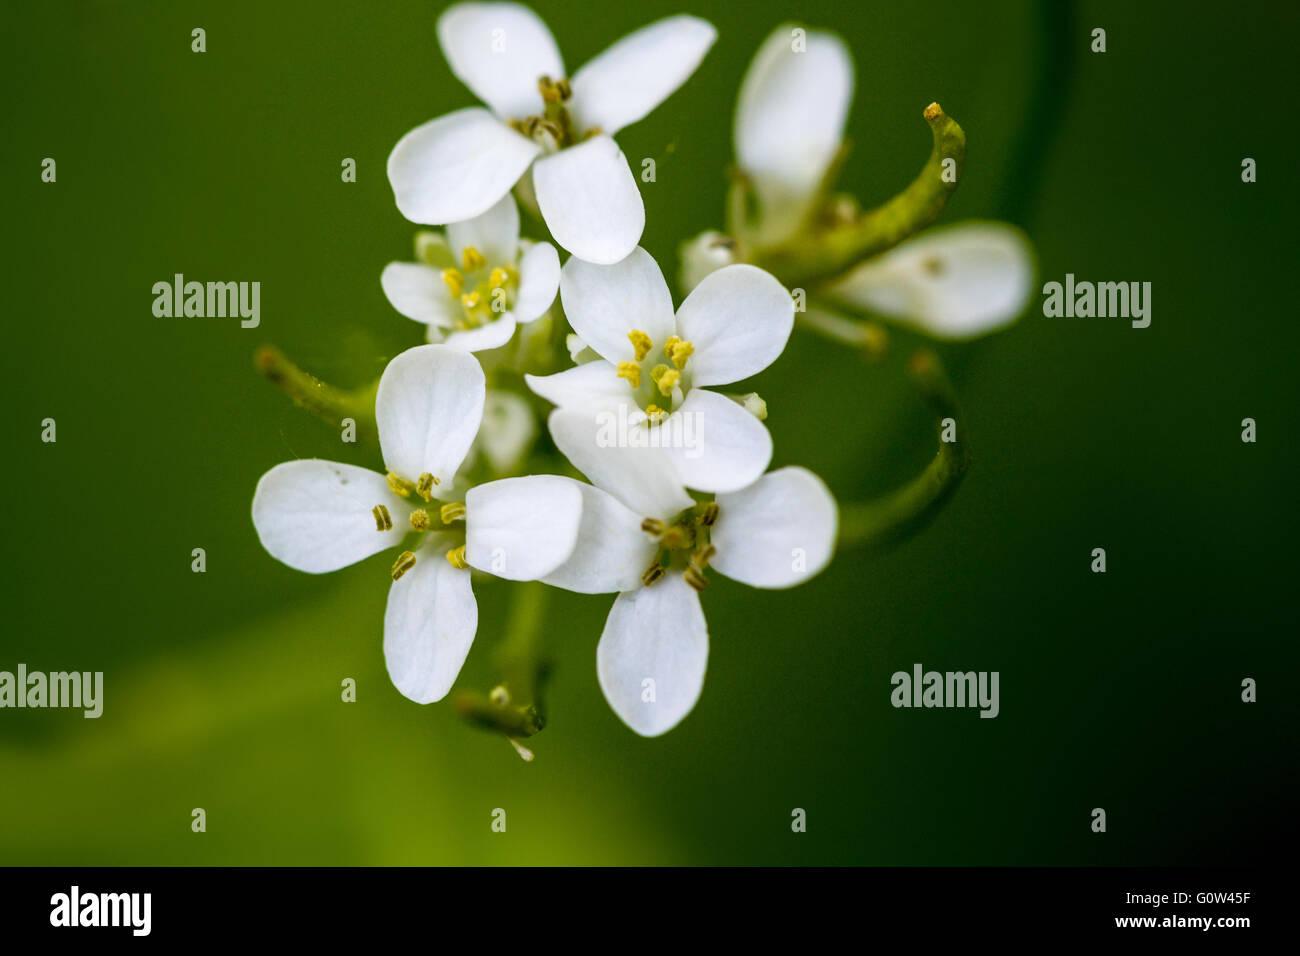 White Garlic Mustard Alliaria petiolata flowers in bunch Stock Photo